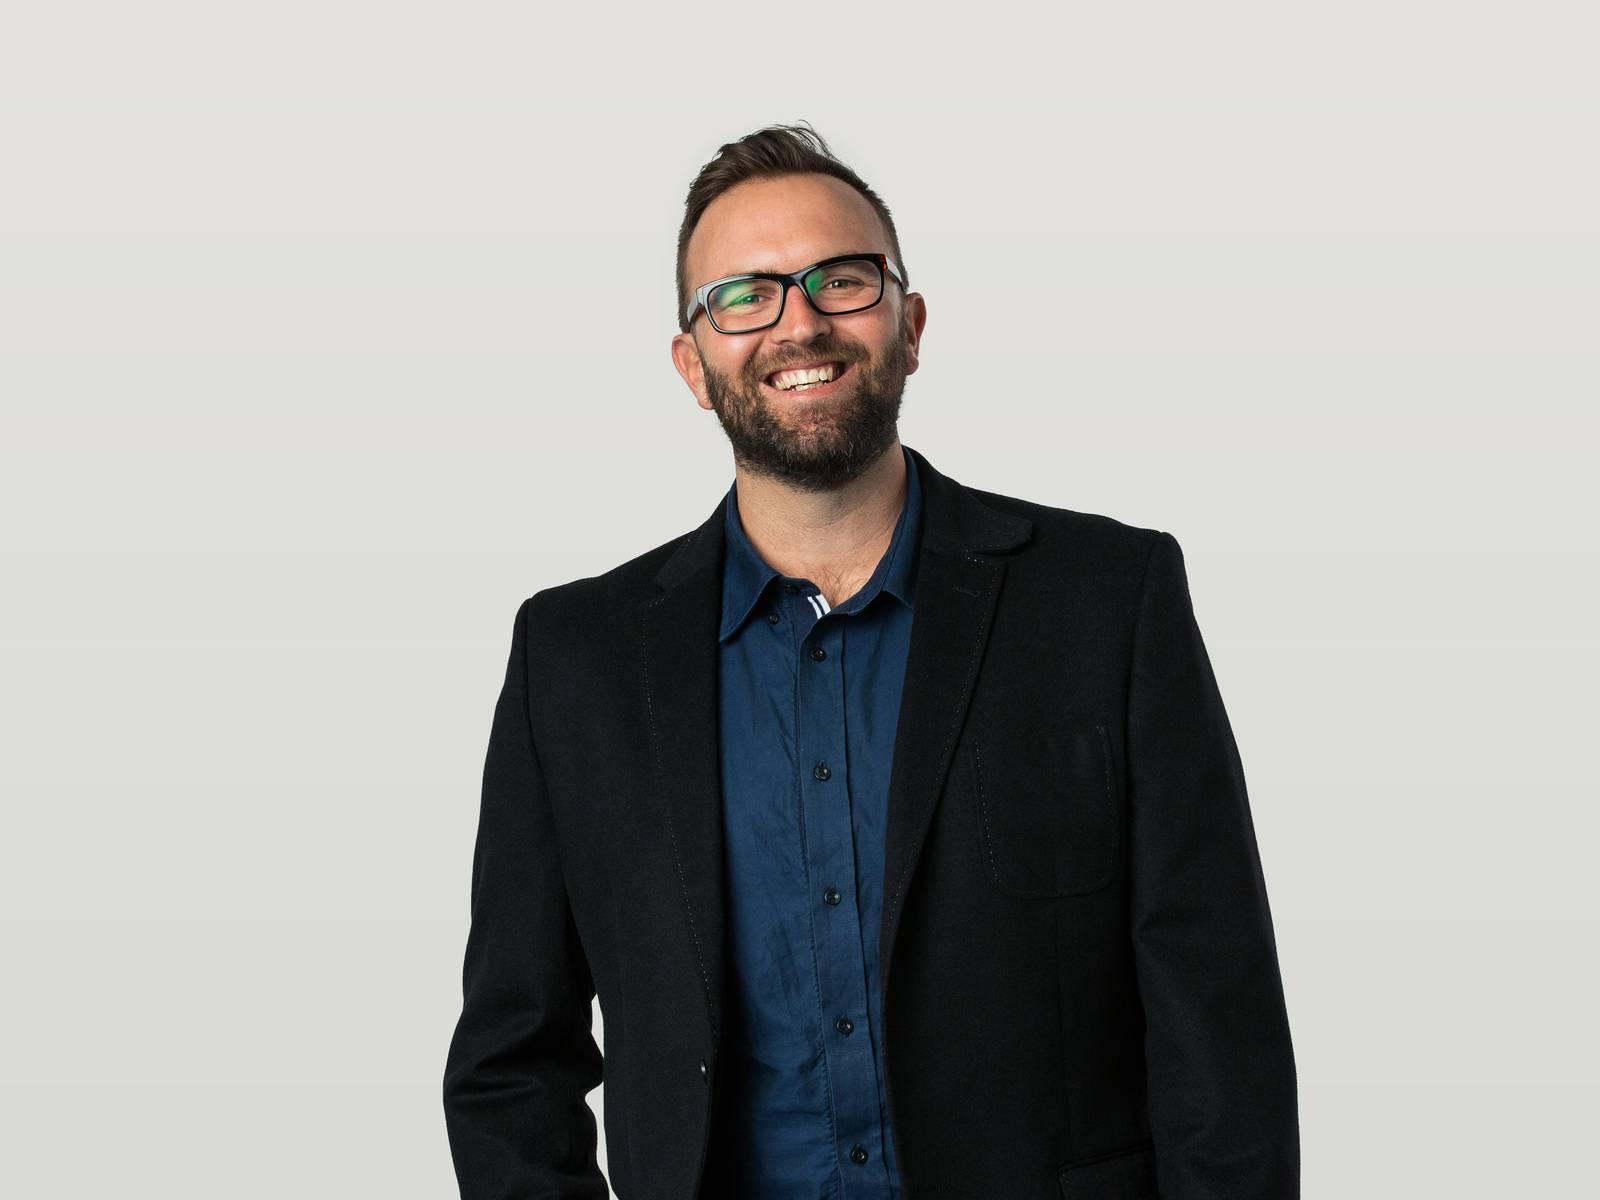 A profile image of Jonny Doig